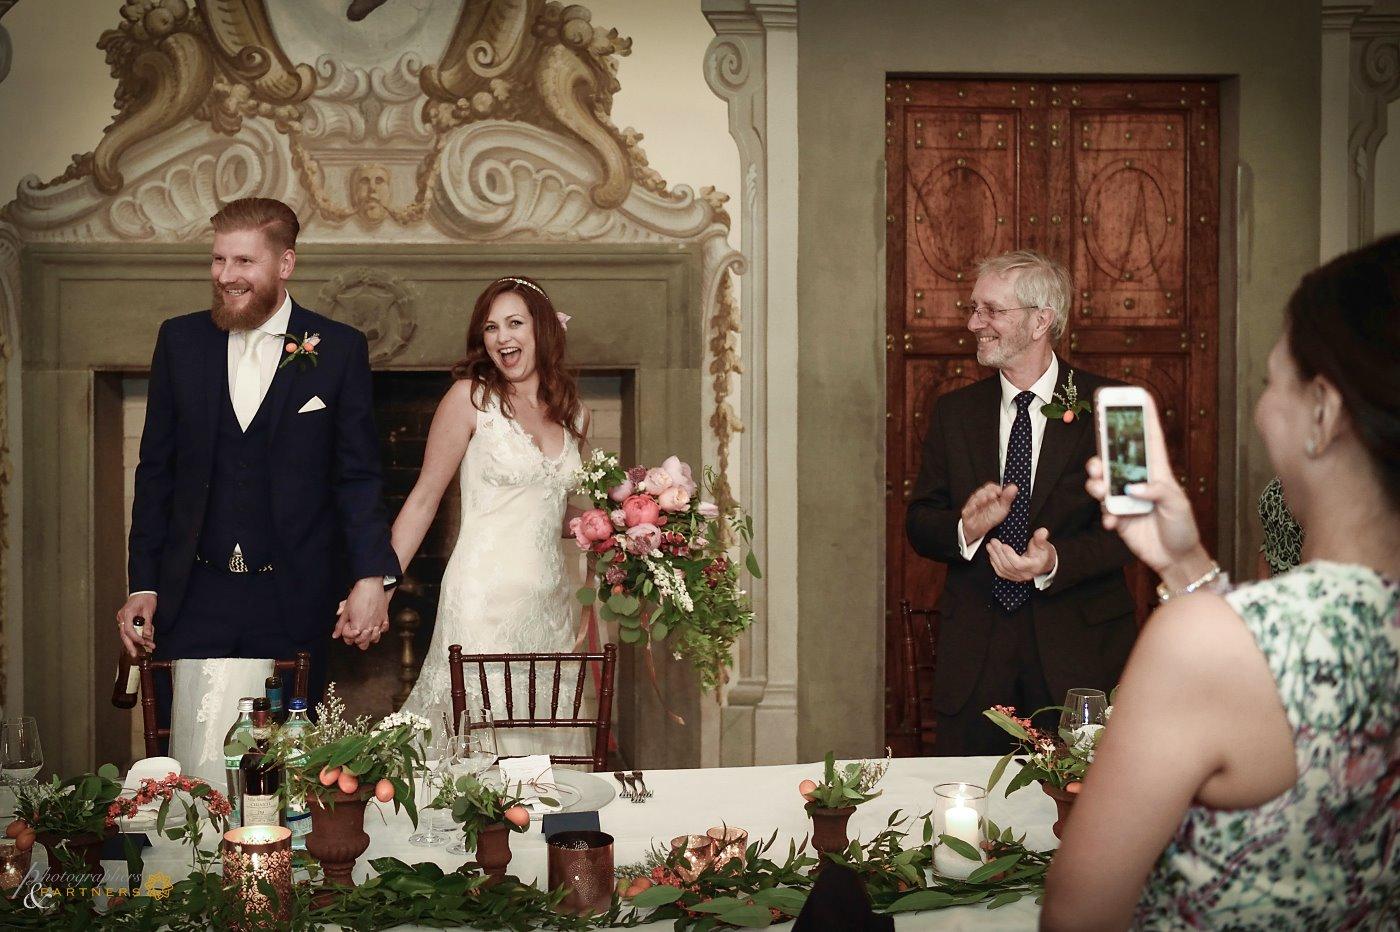 photos_weddings_castello_oliveto_19.jpg